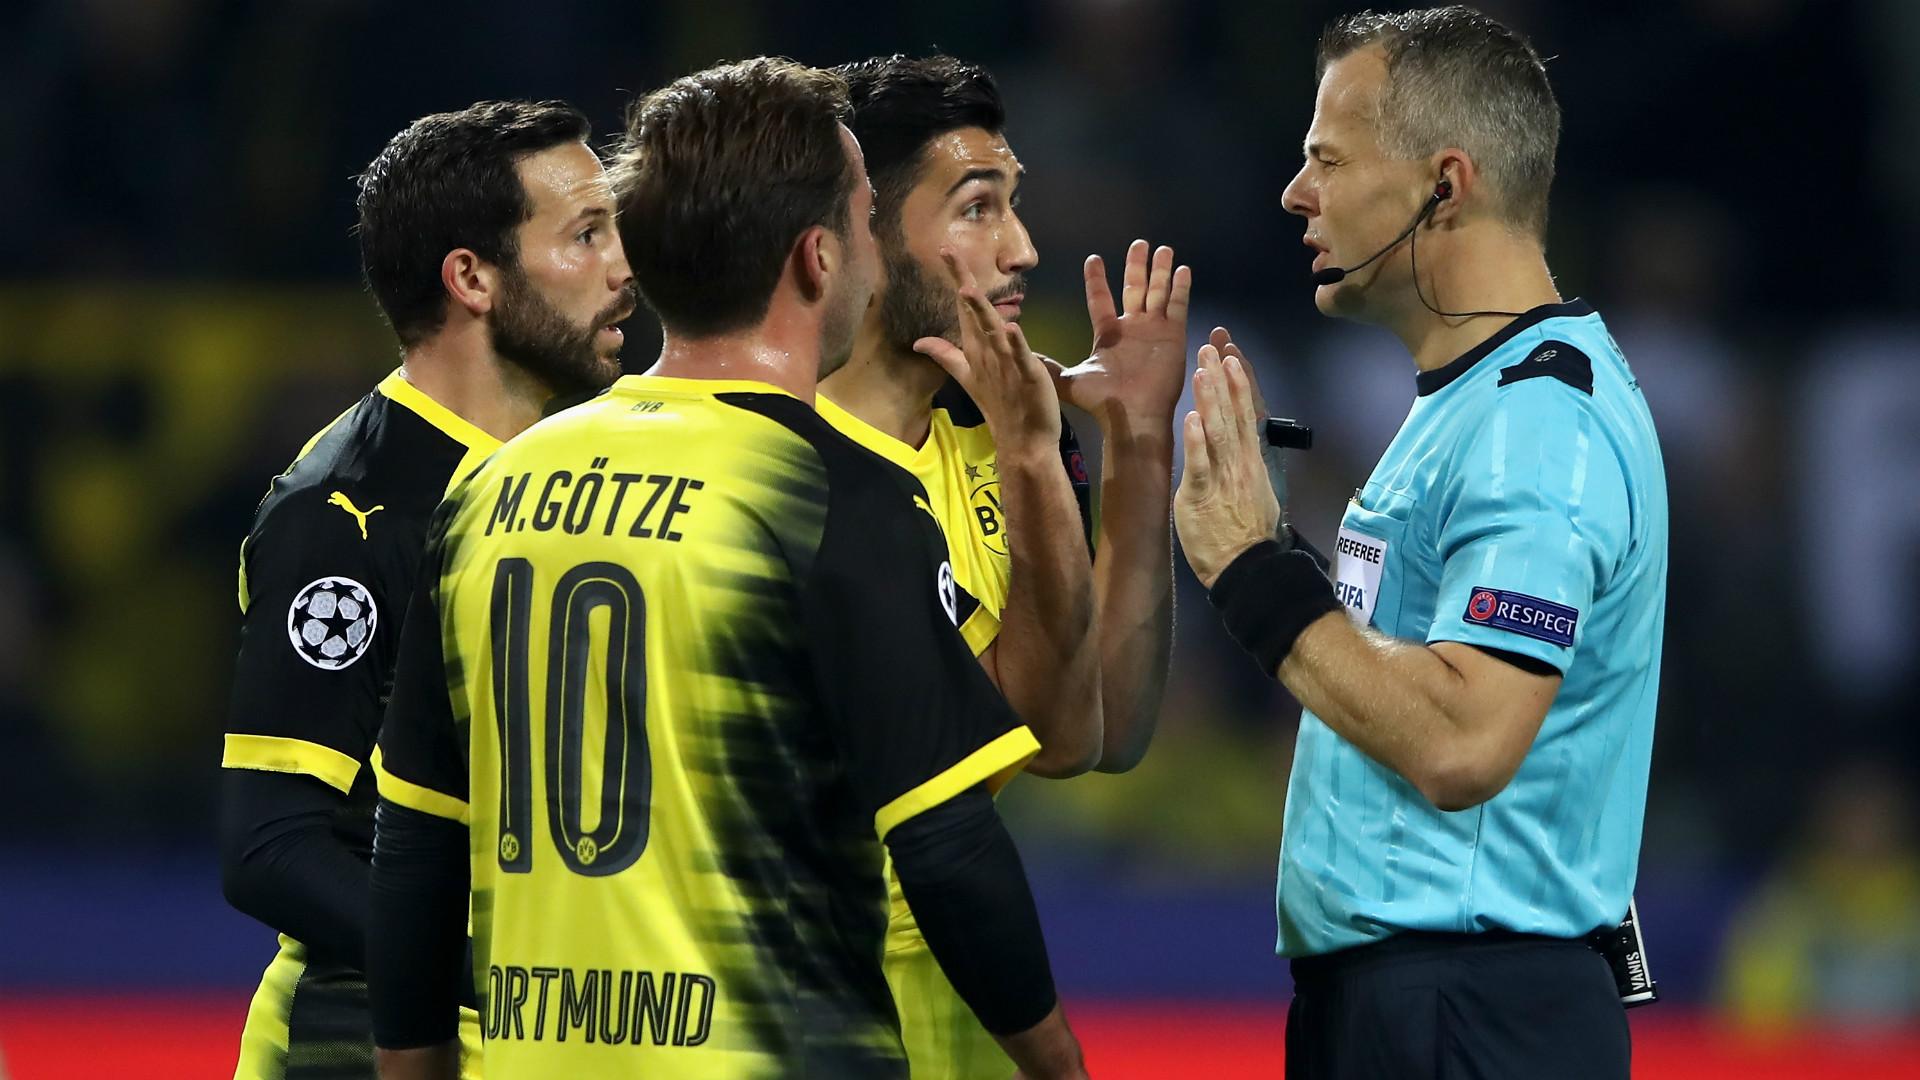 Nuri Sahin Bjorn Kuipers Borussia Dortmund Real Madrid Champions League 26092017